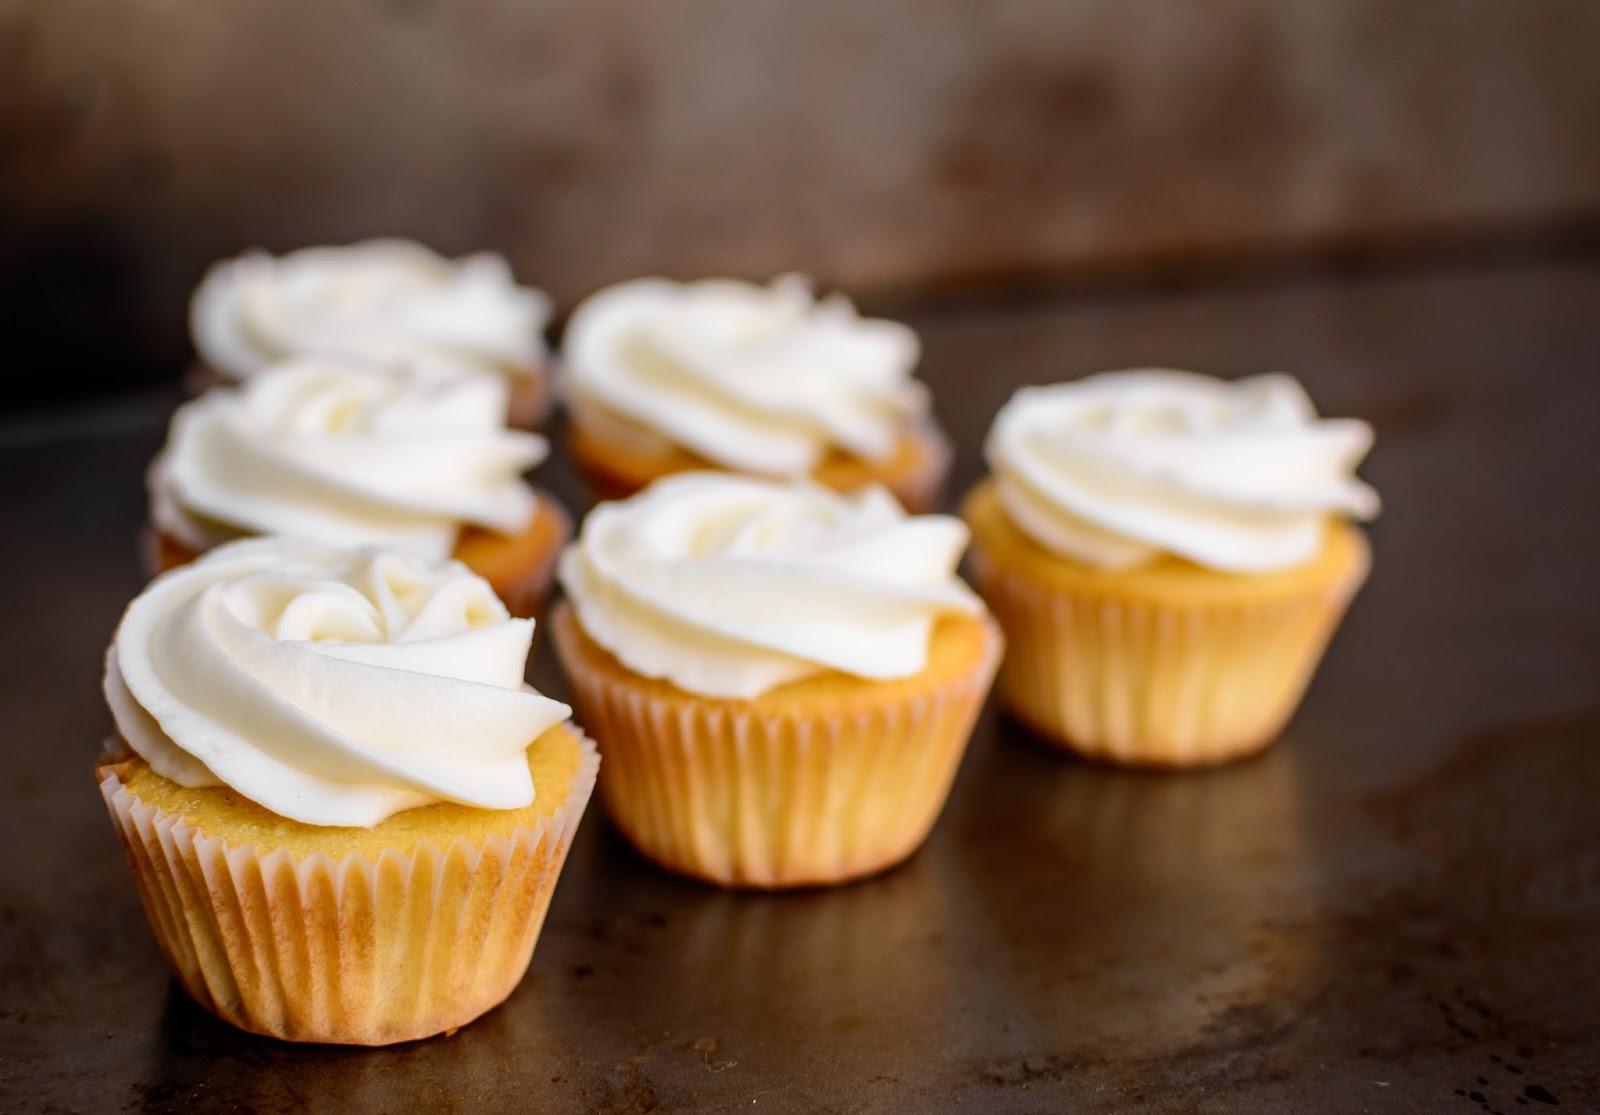 All Food Considered: Mini Vanilla Bean Cupcakes